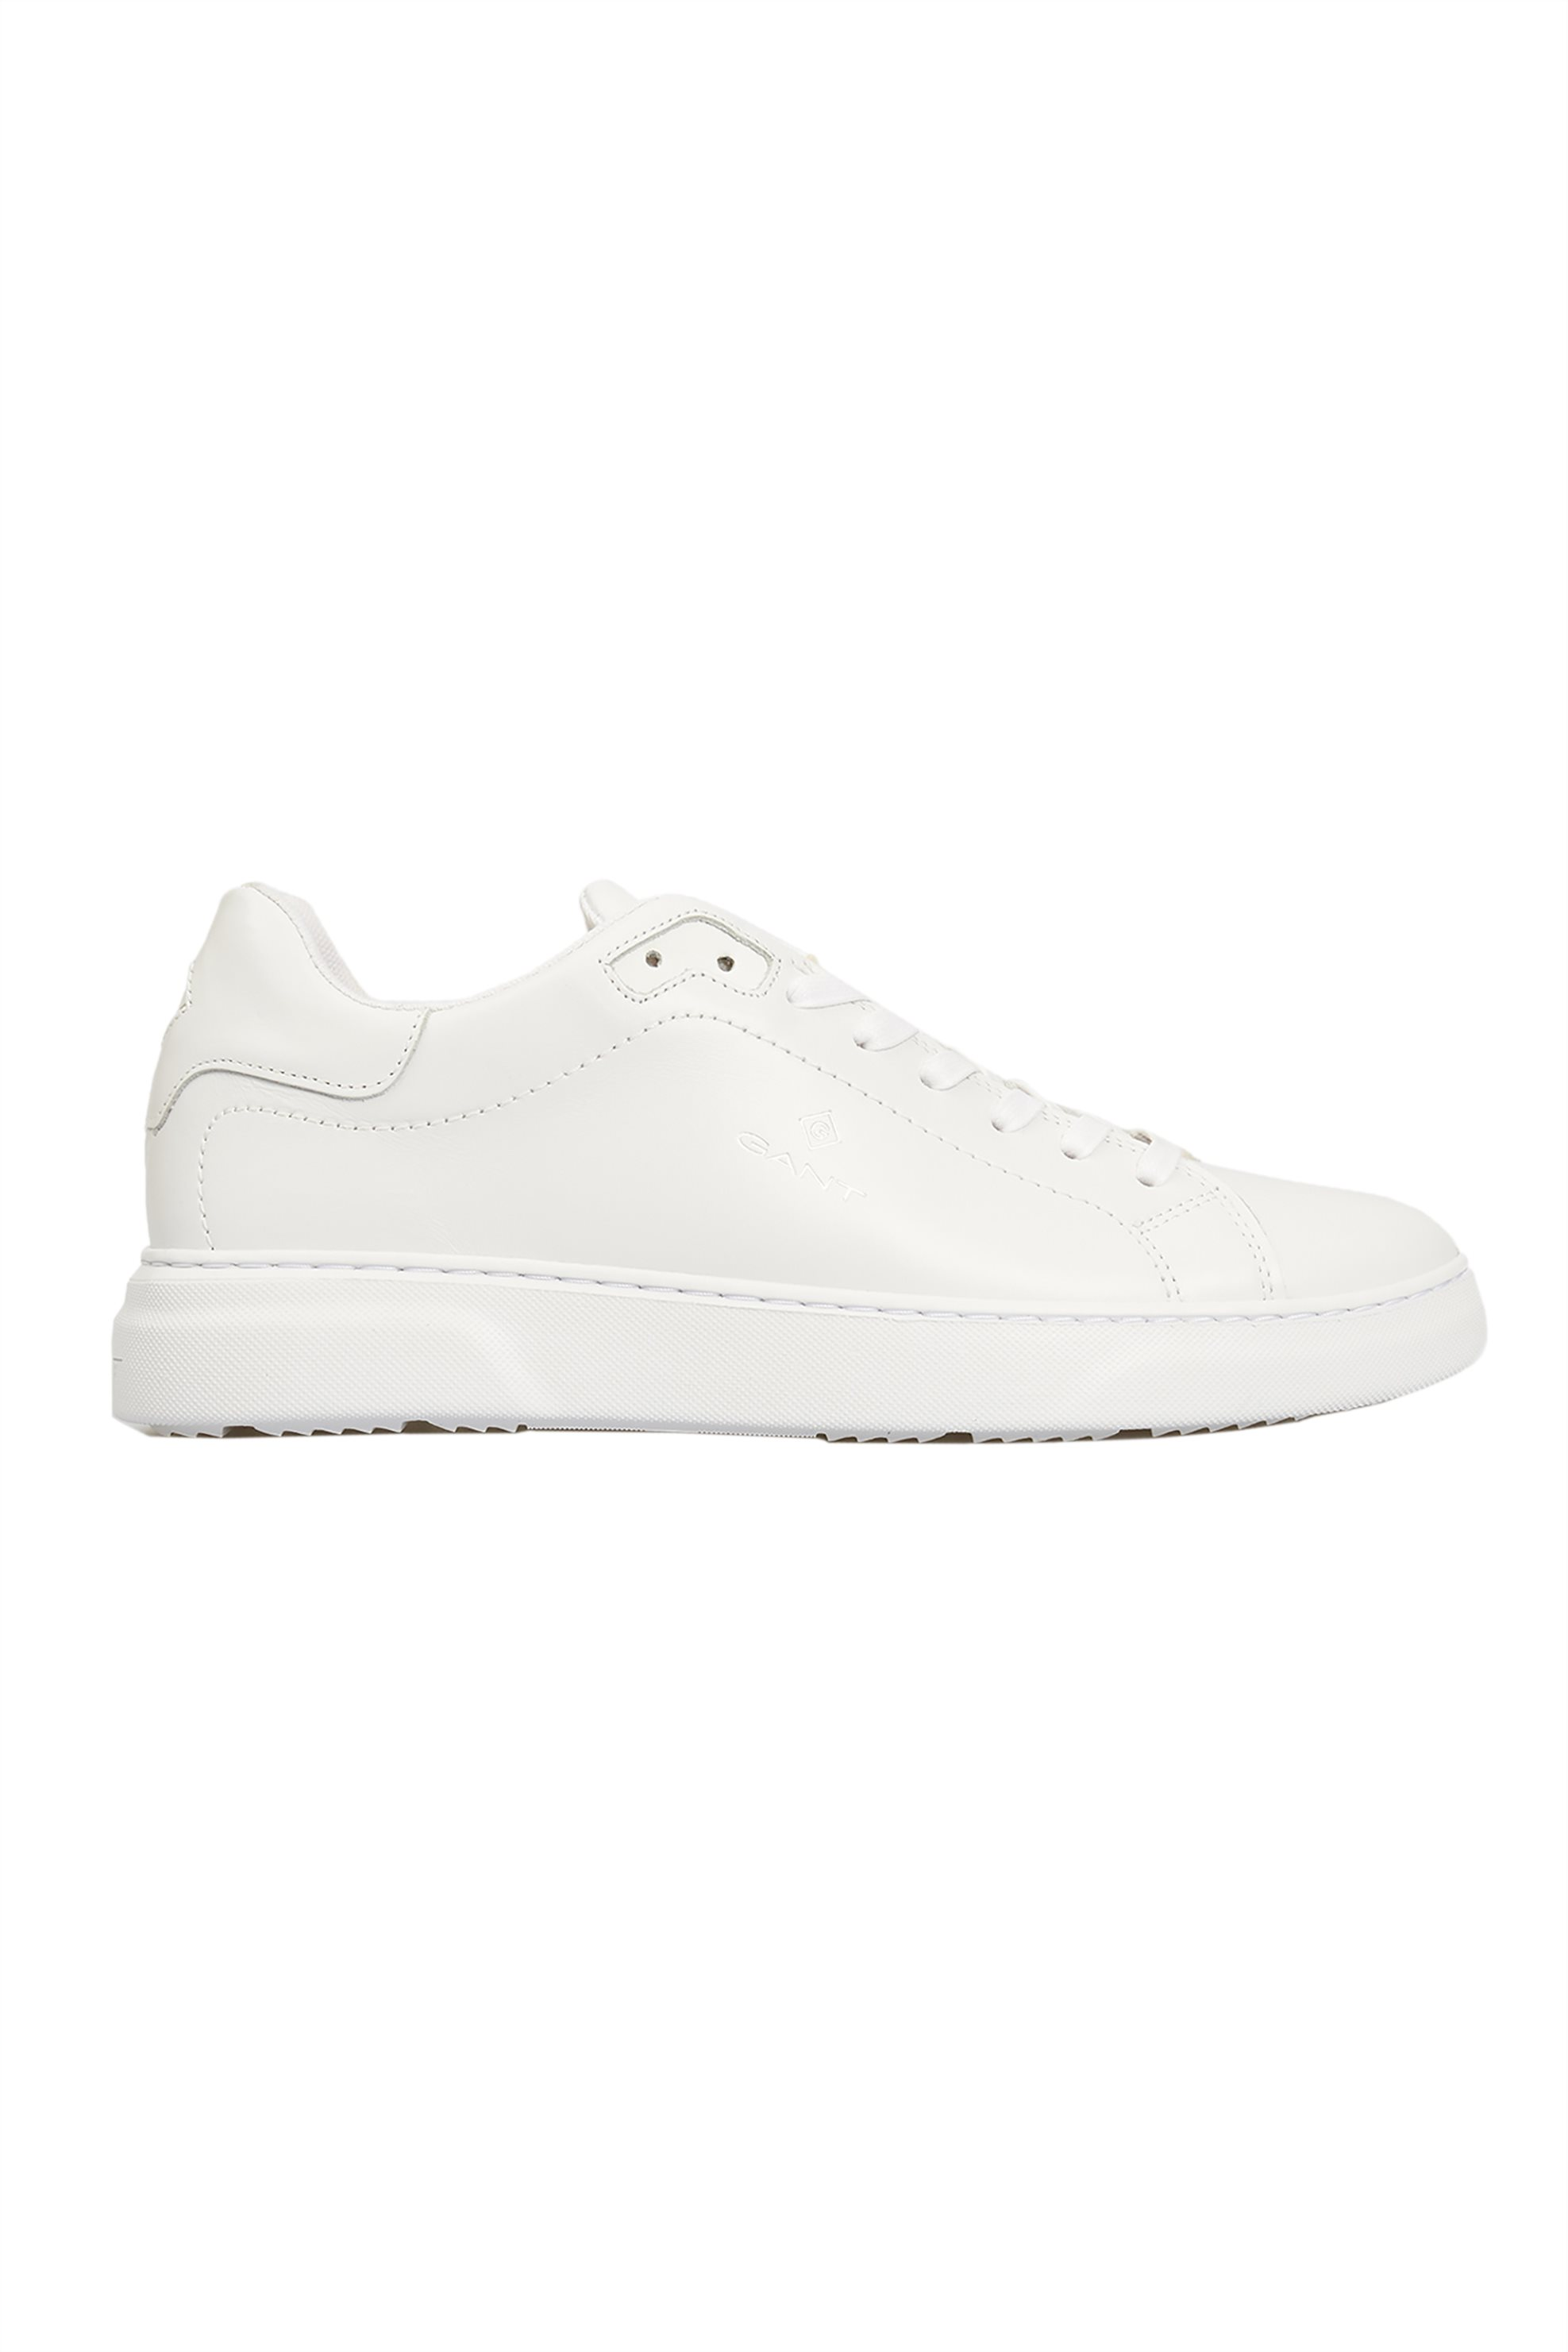 "Gant ανδρικά sneakers με logo print στο πλάι ""Joree"" – 22631645 – Λευκό"